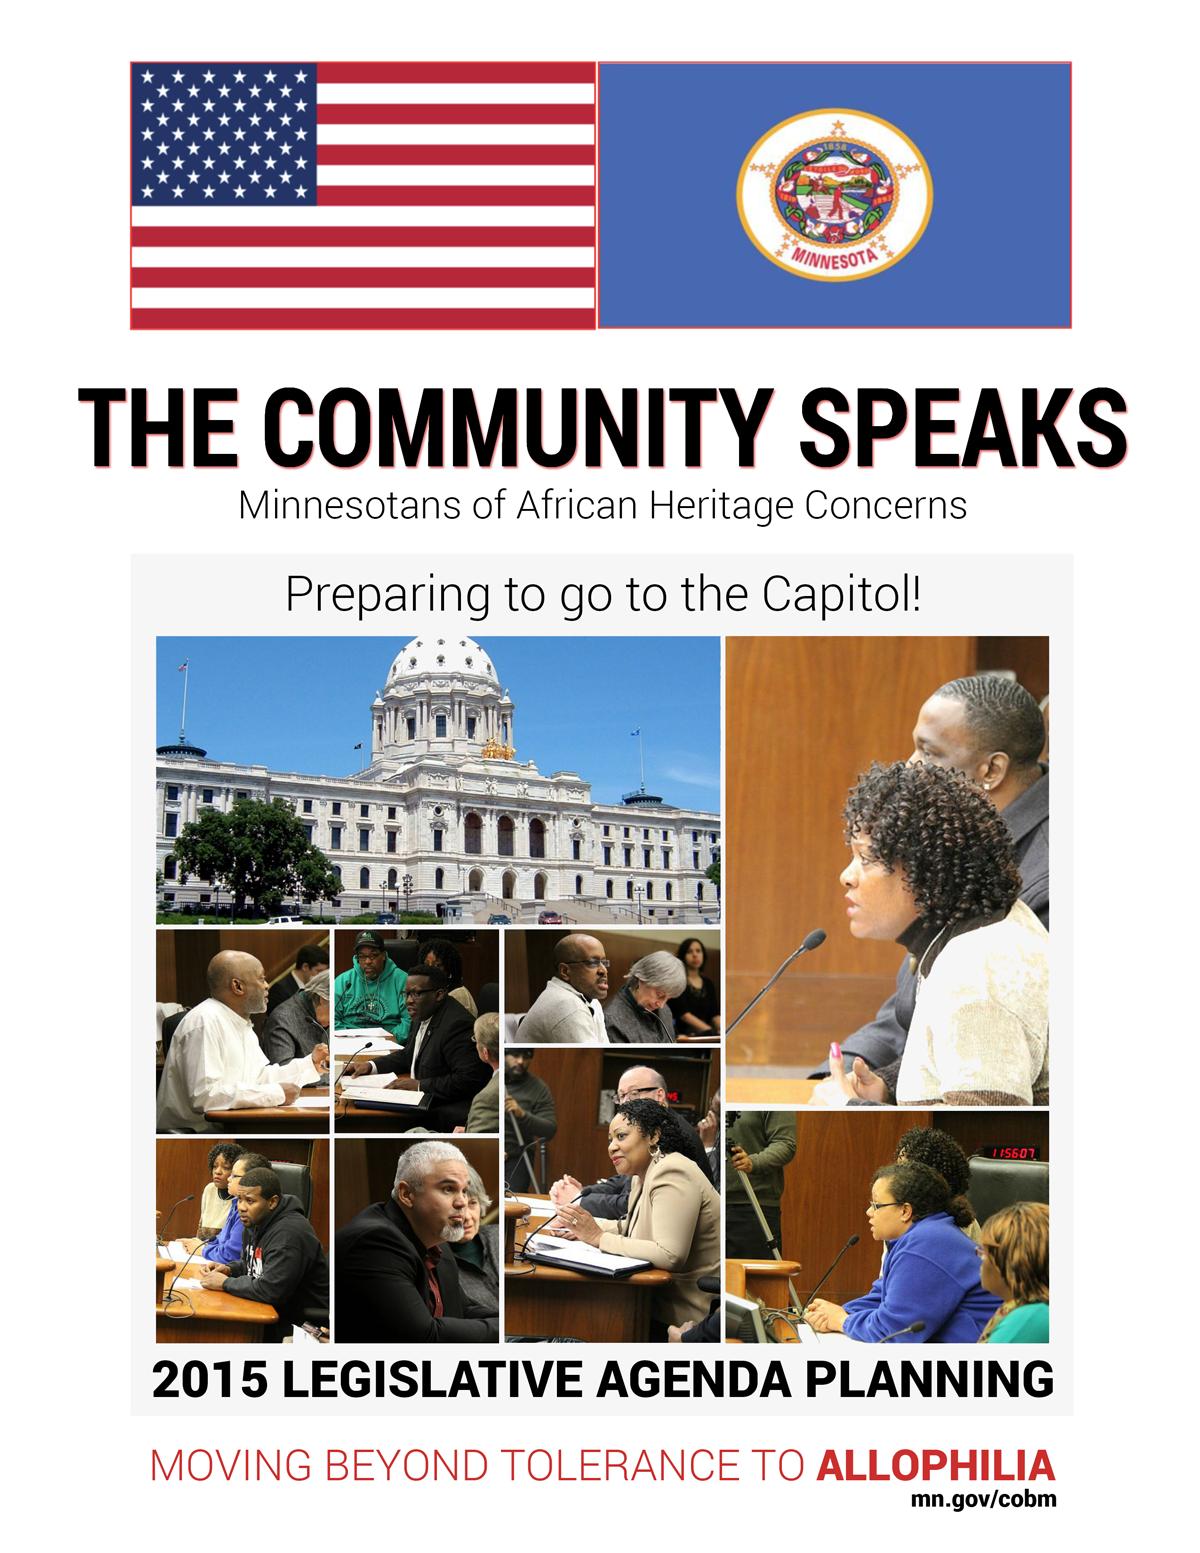 The Community Speaks! Report